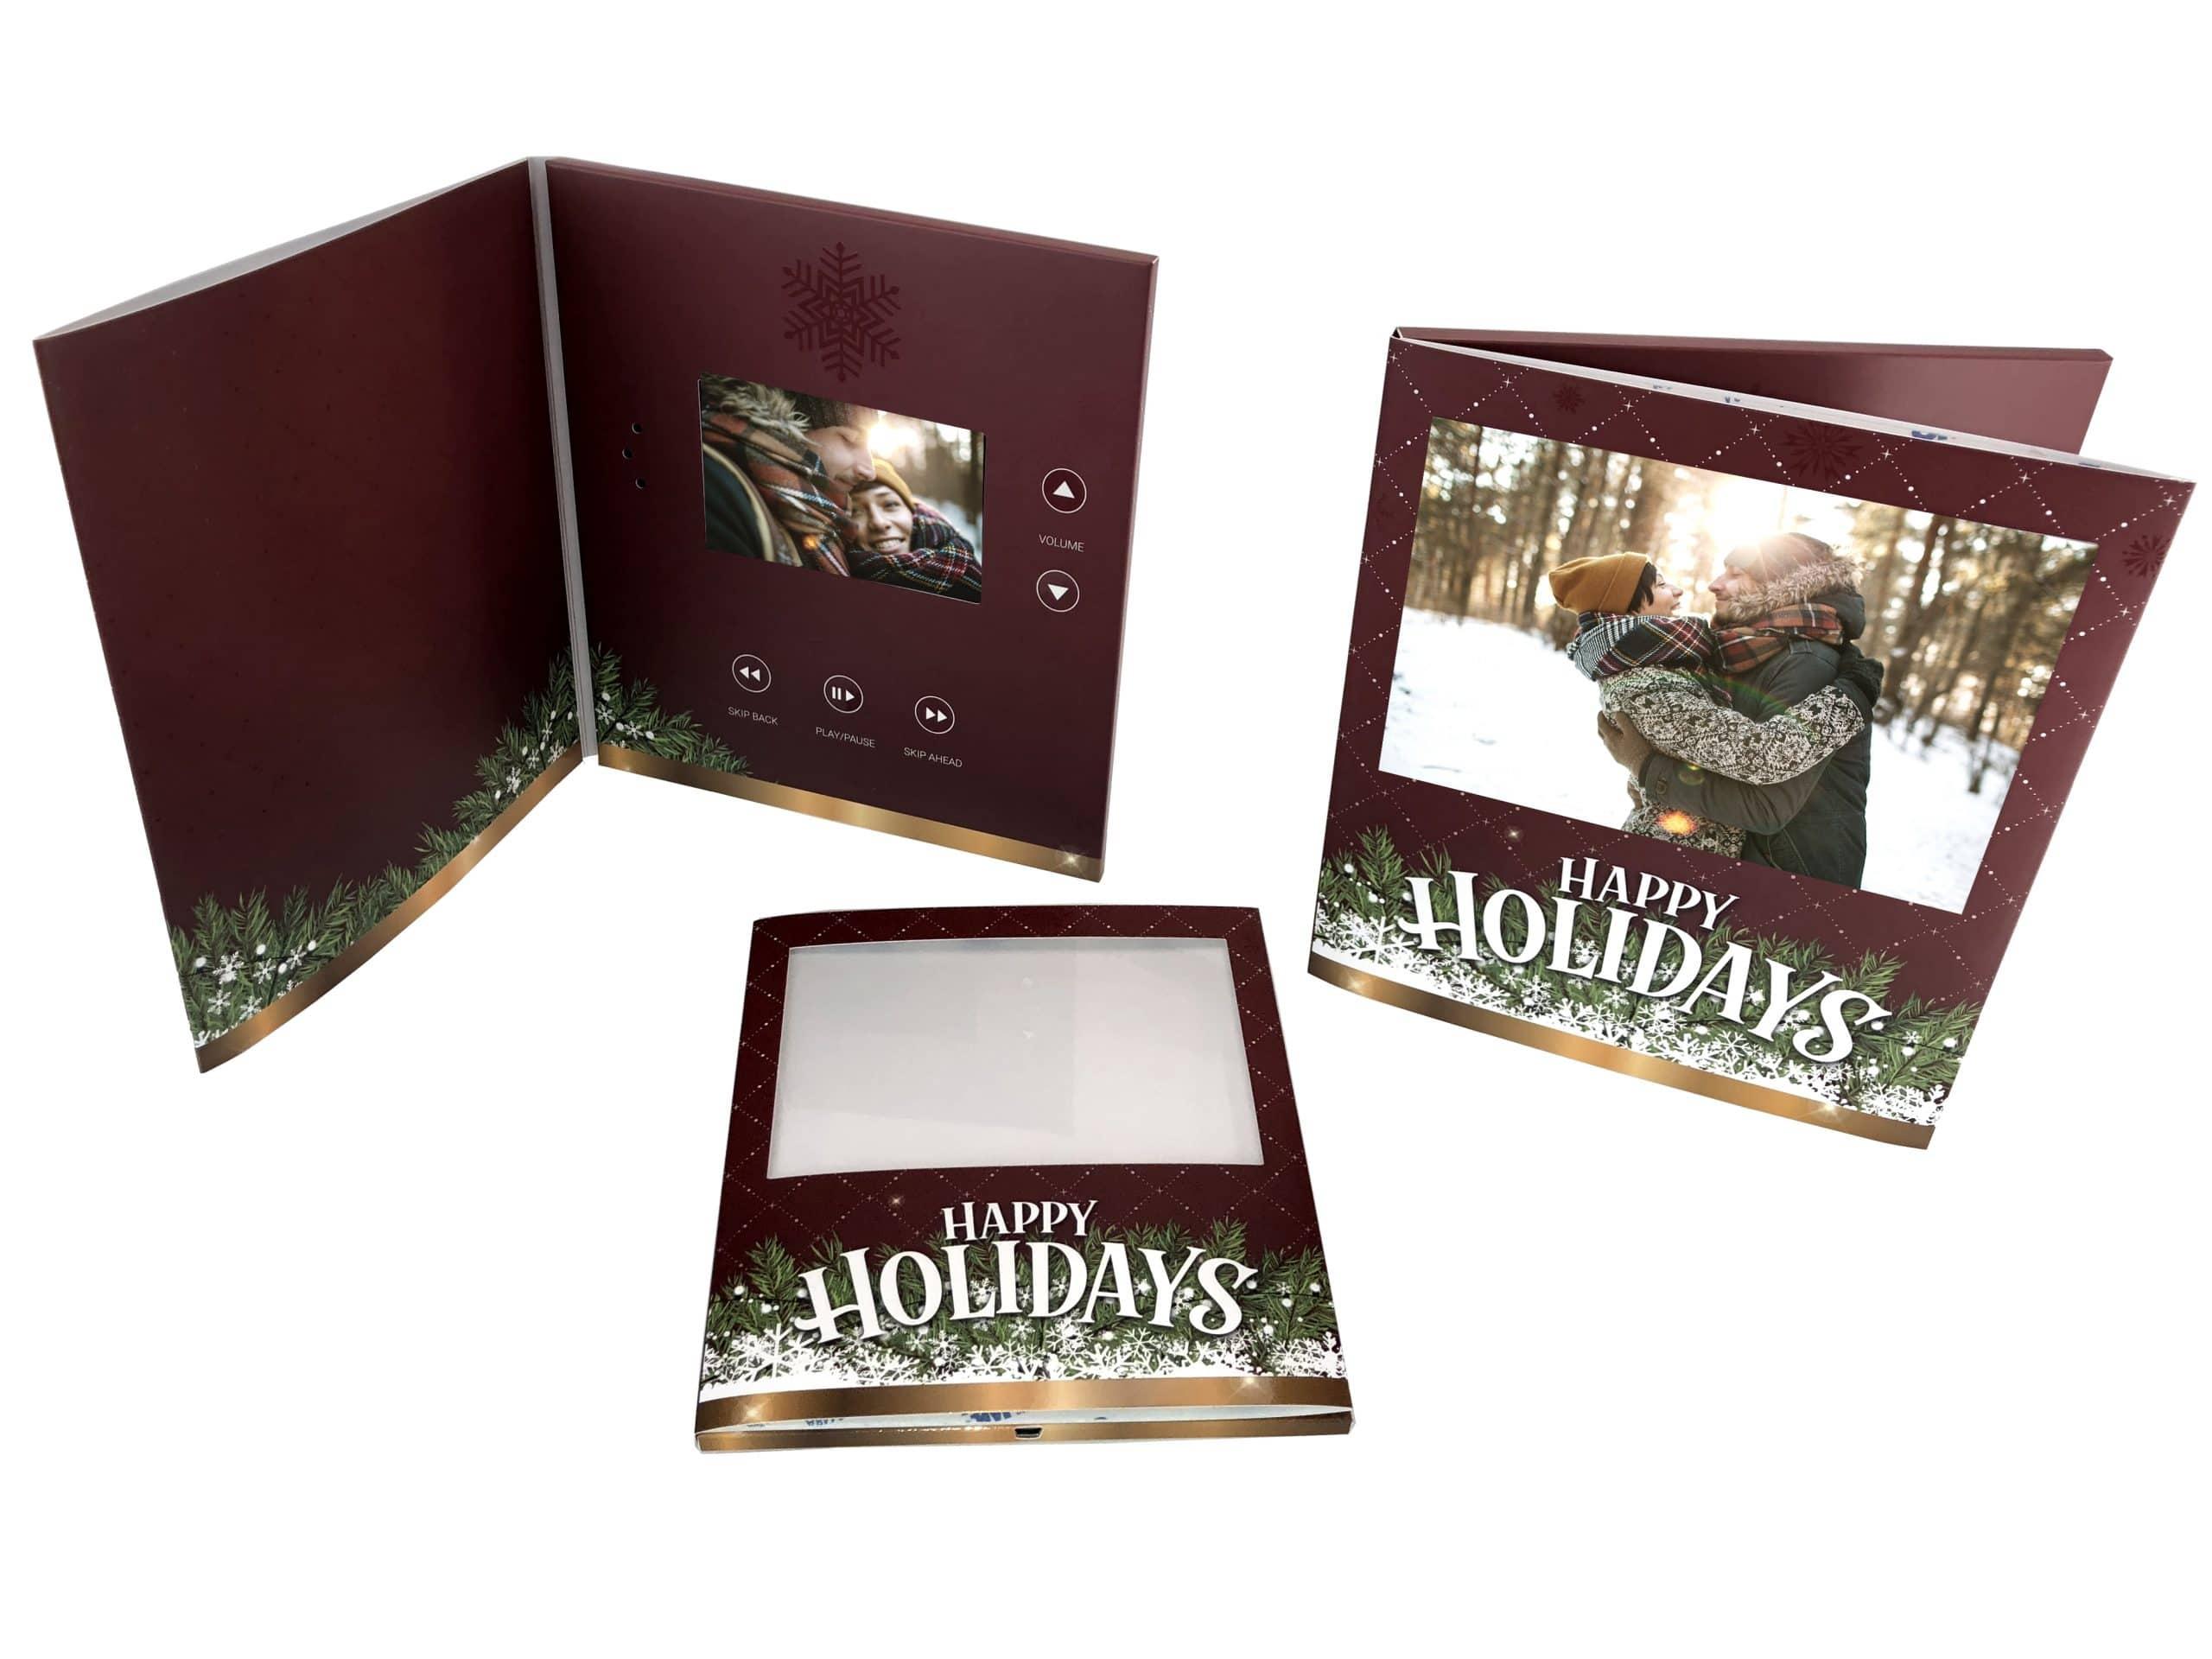 "Holiday  MediaBuk Brochure 7 x 7.5 - Screen: 4"" Buy Now"